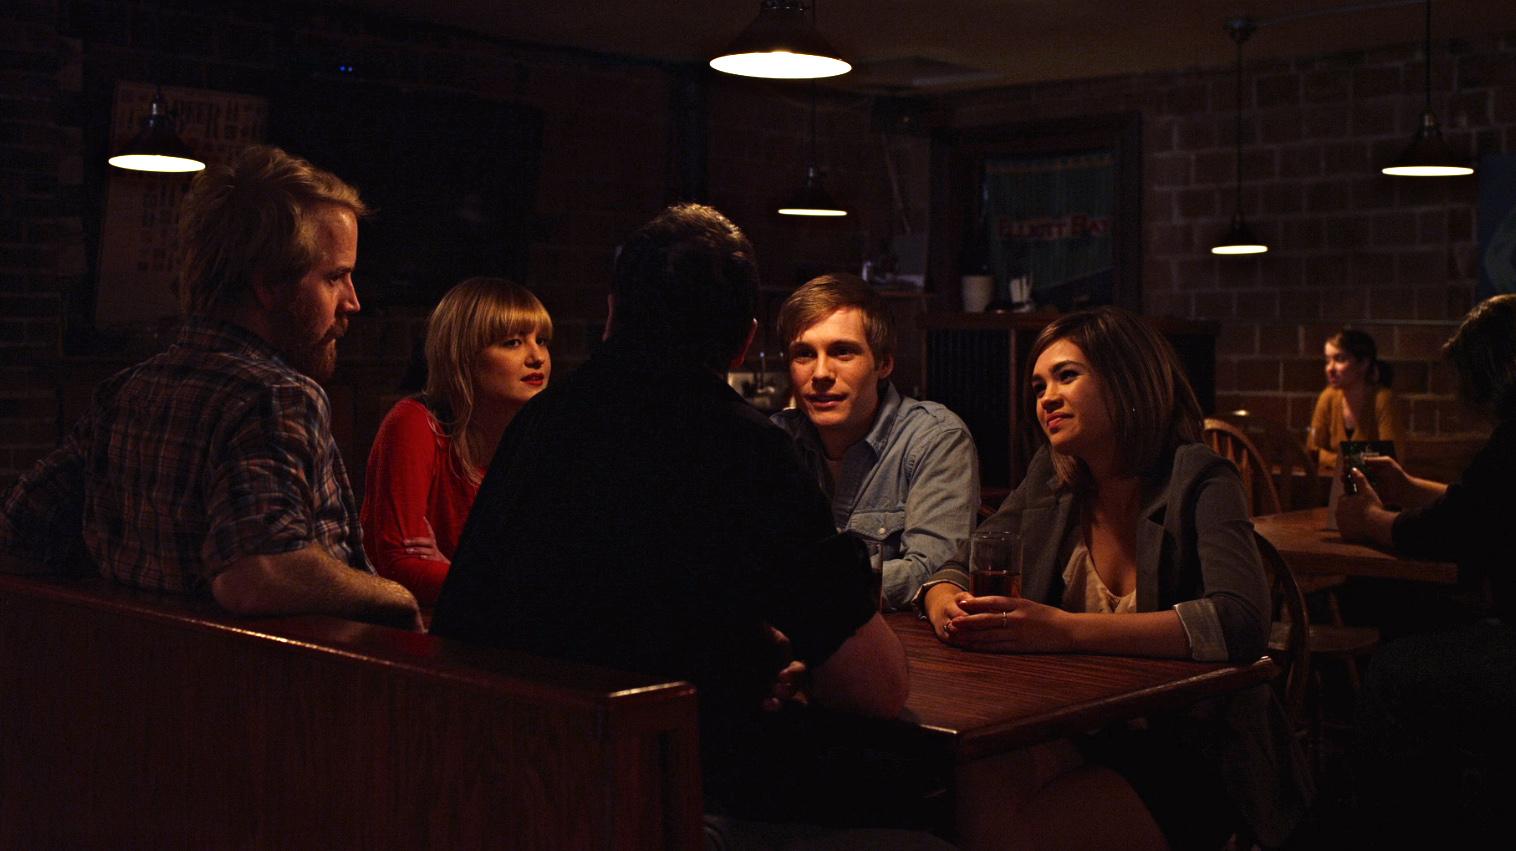 4 - Zachary Booth, DENIM - Denim joins Megans Friends at Bar.jpg